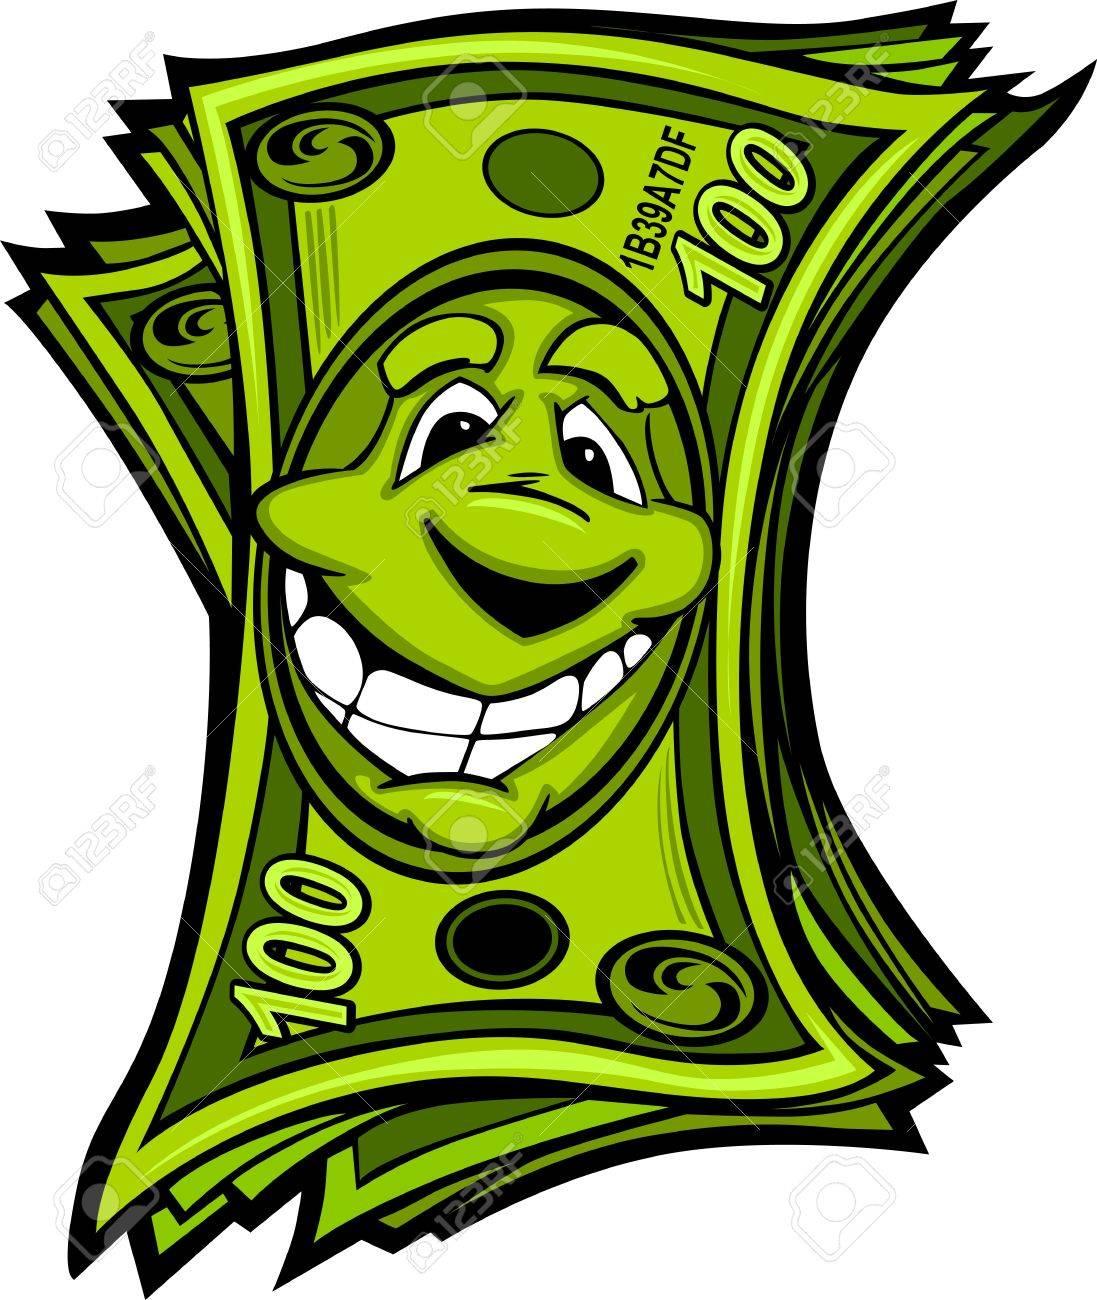 1097x1300 Cartoon Money Hundred Dollar Bills With Smiling Face Cartoon